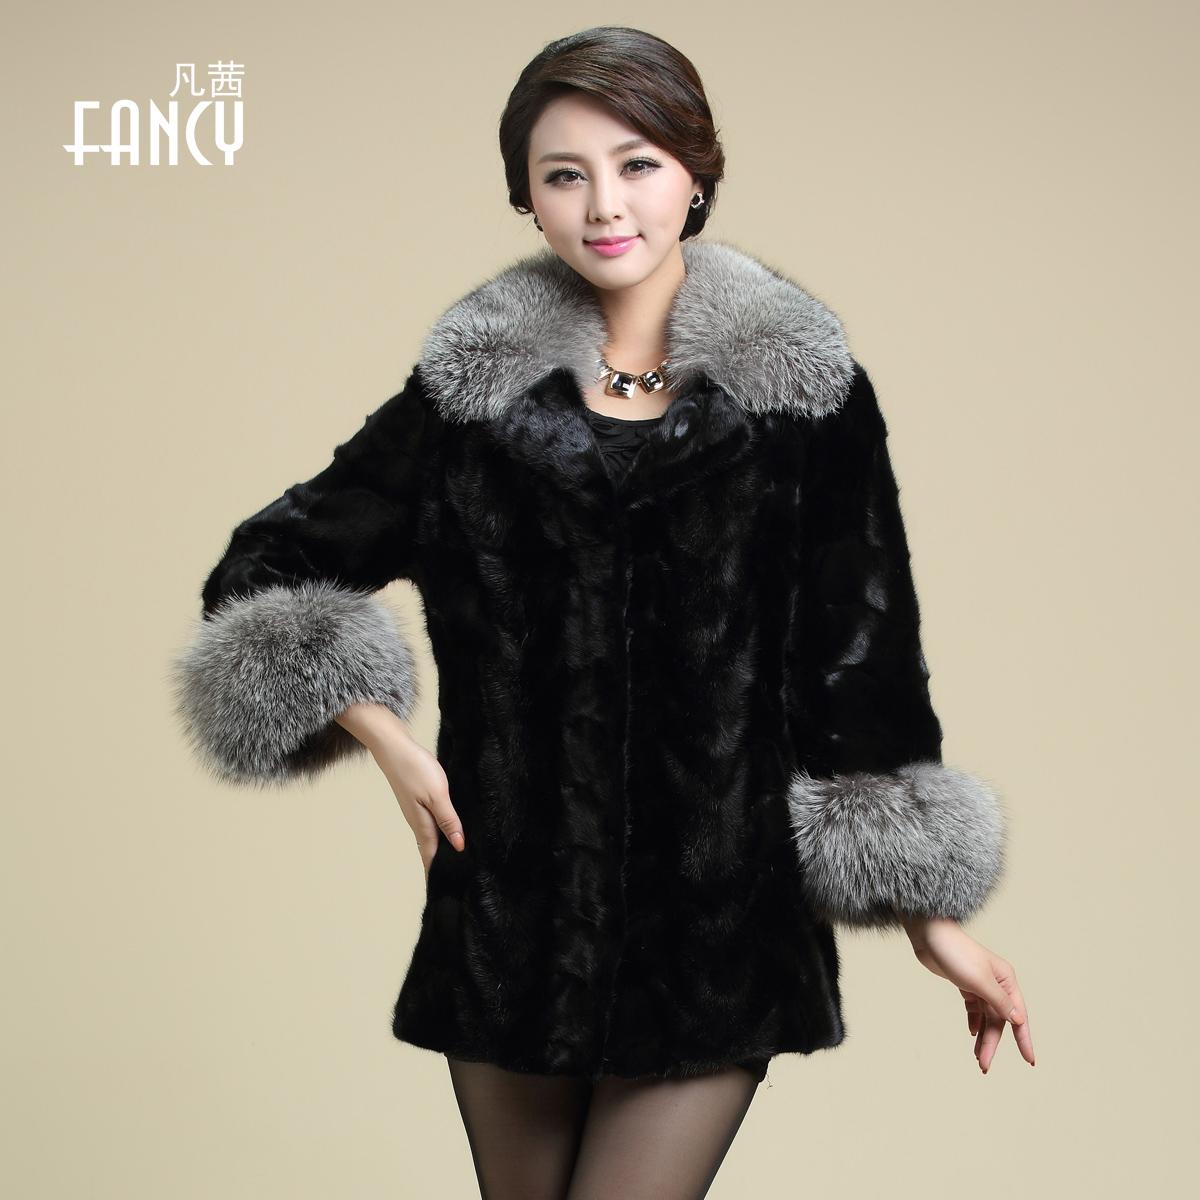 2013 Autumn and Winter Womens Natural Piece Mink Fur Coat with Silver Fox Fur Collar Female Warm Outerwear Garment VK2001Одежда и ак�е��уары<br><br><br>Aliexpress